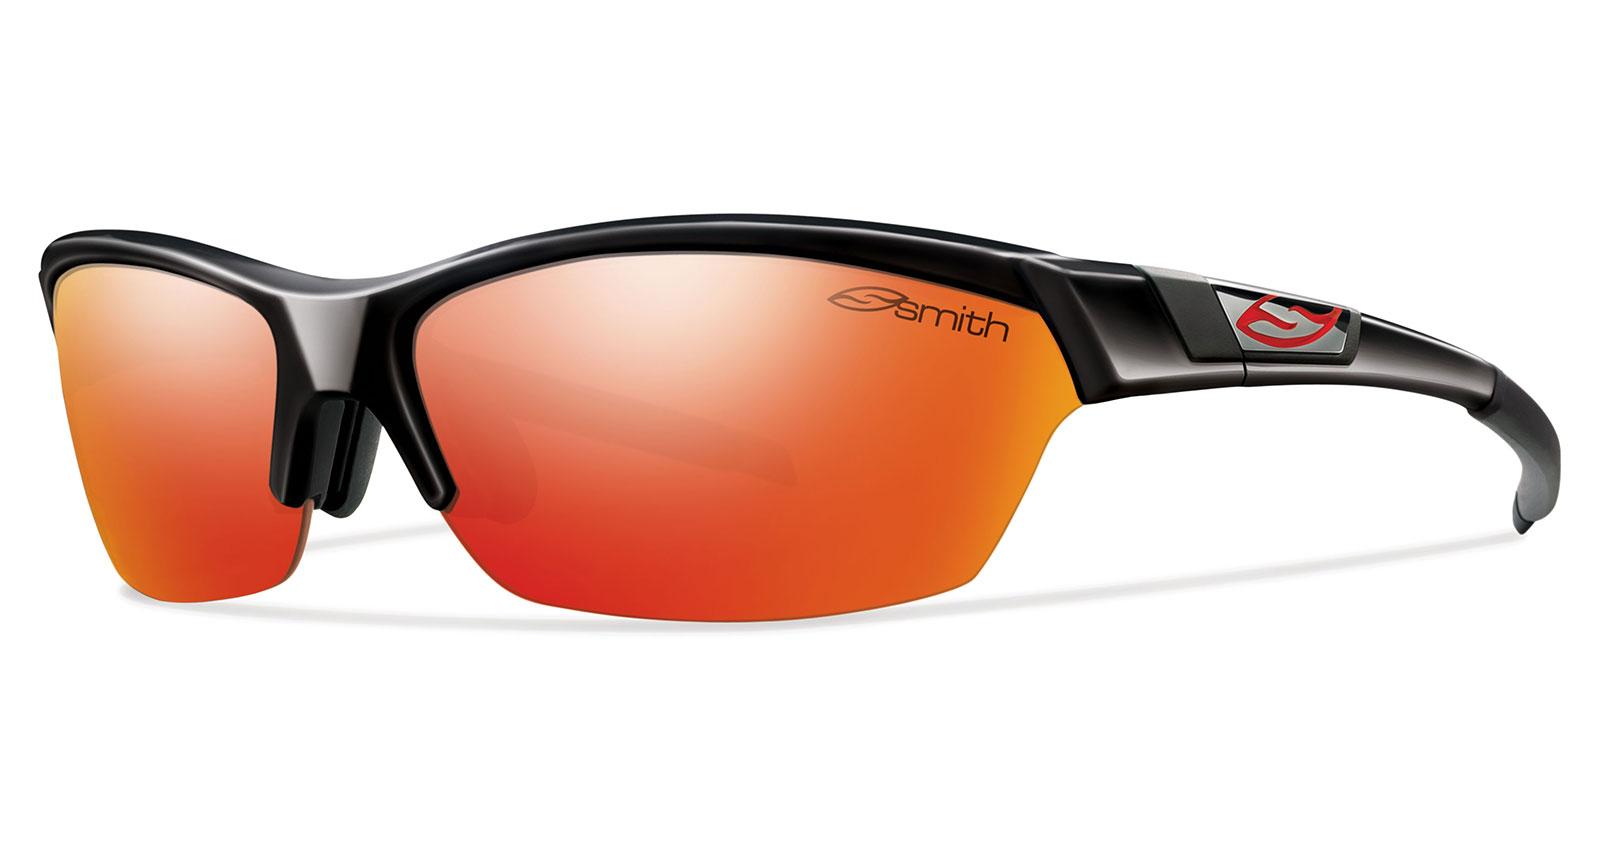 Smith optics polarized fishing sunglasses louisiana for Smith optics fishing